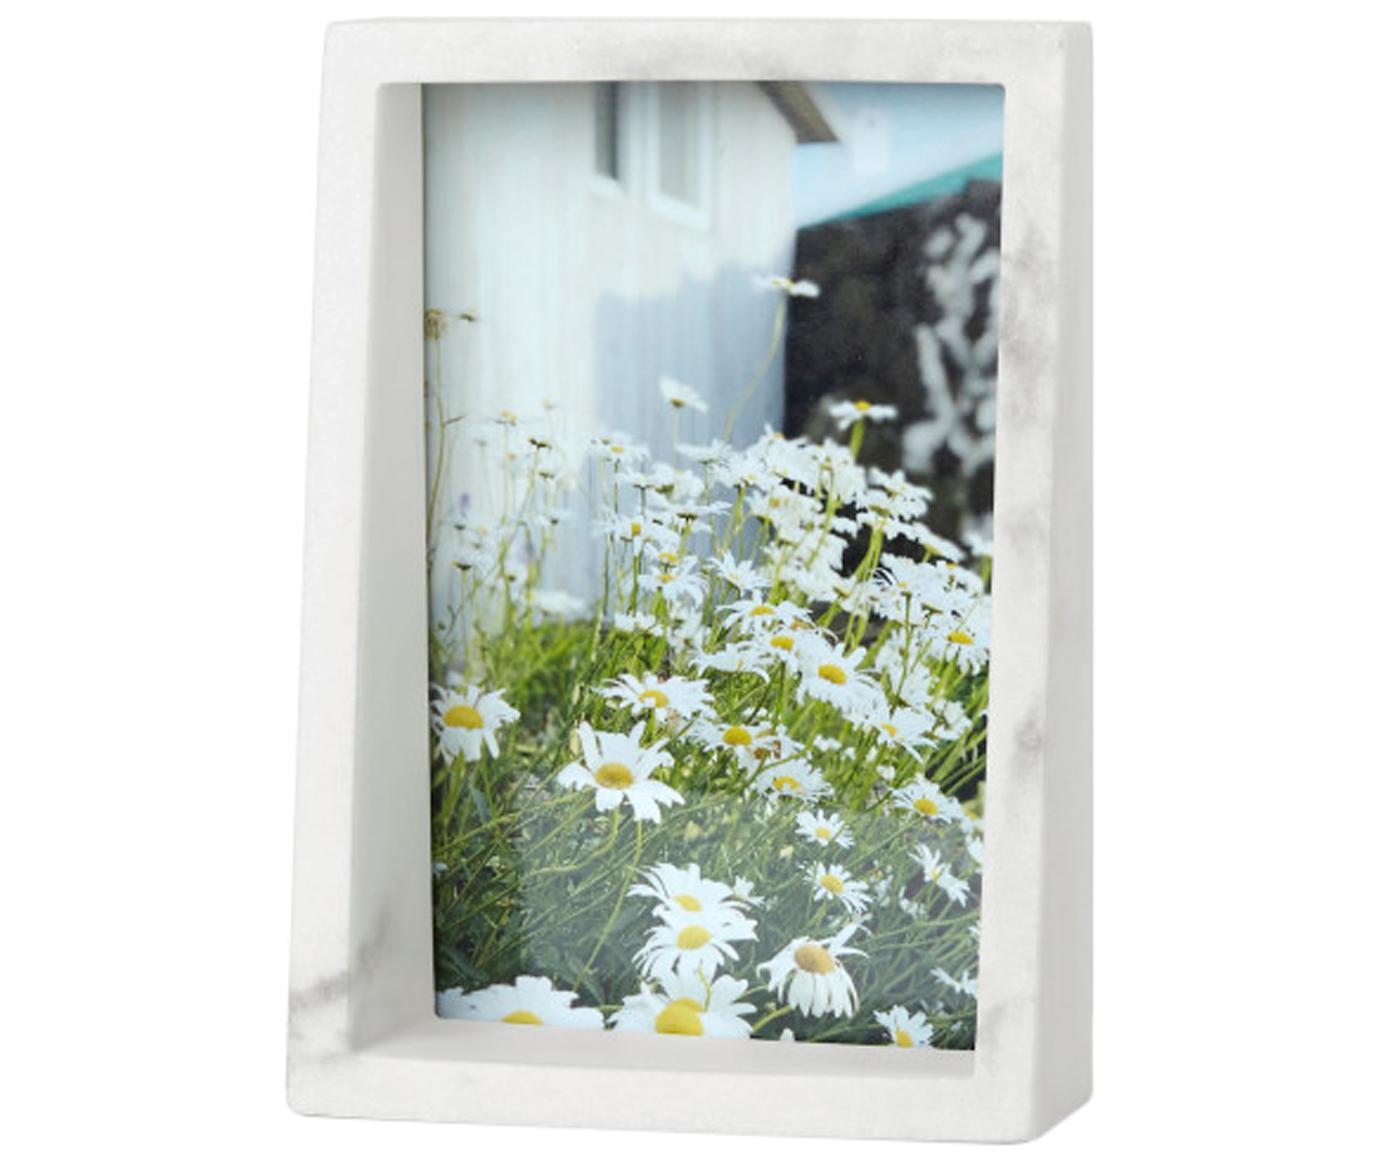 Fotolijstje Edge, Polyresin in marmerlook, Wit, 10 x 15 cm